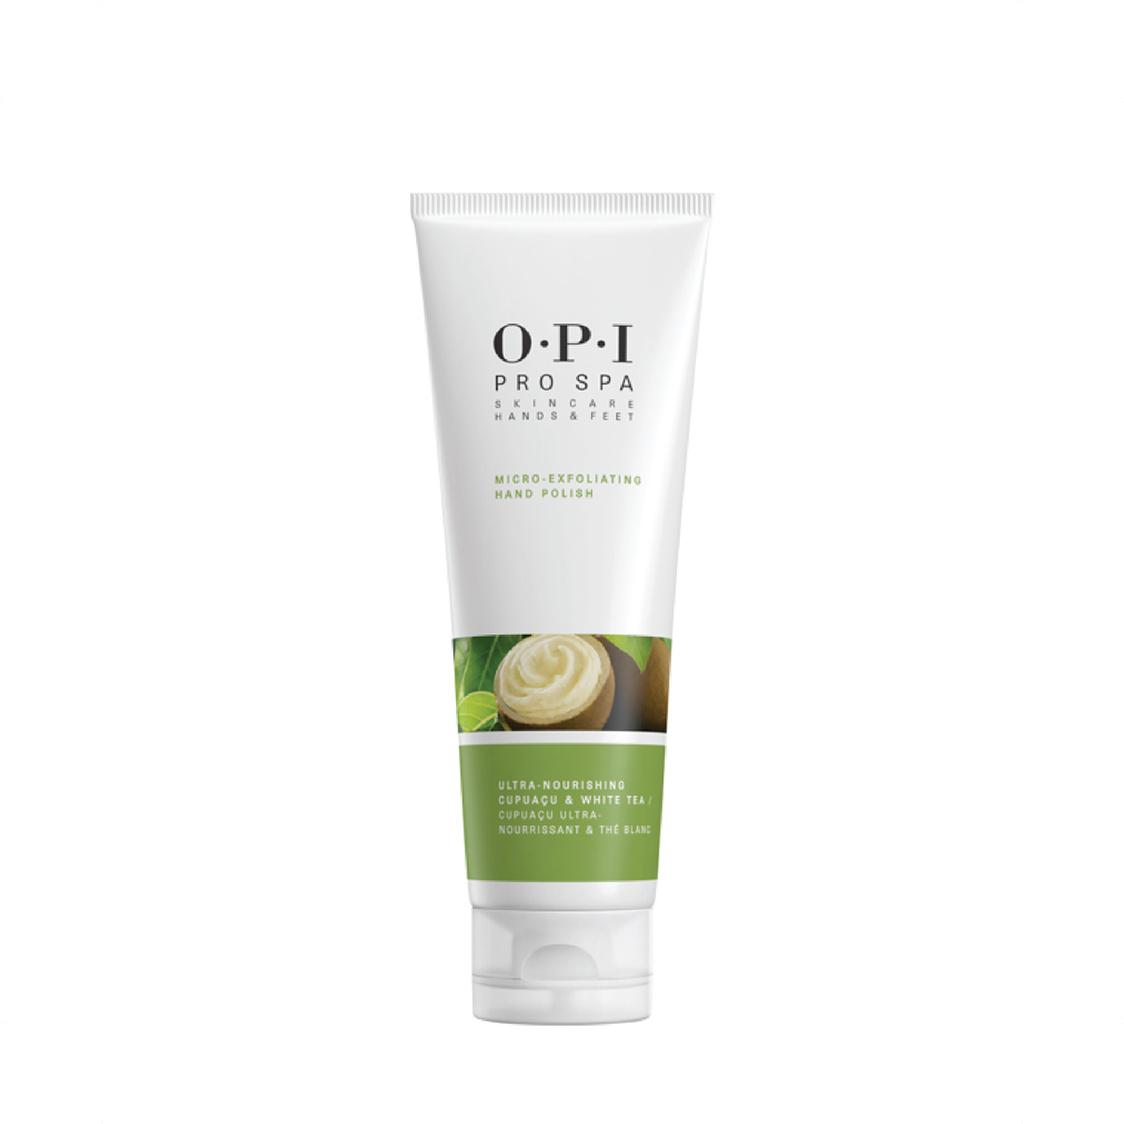 Opi Prospa Microexfoliat Hand Polish 236ml